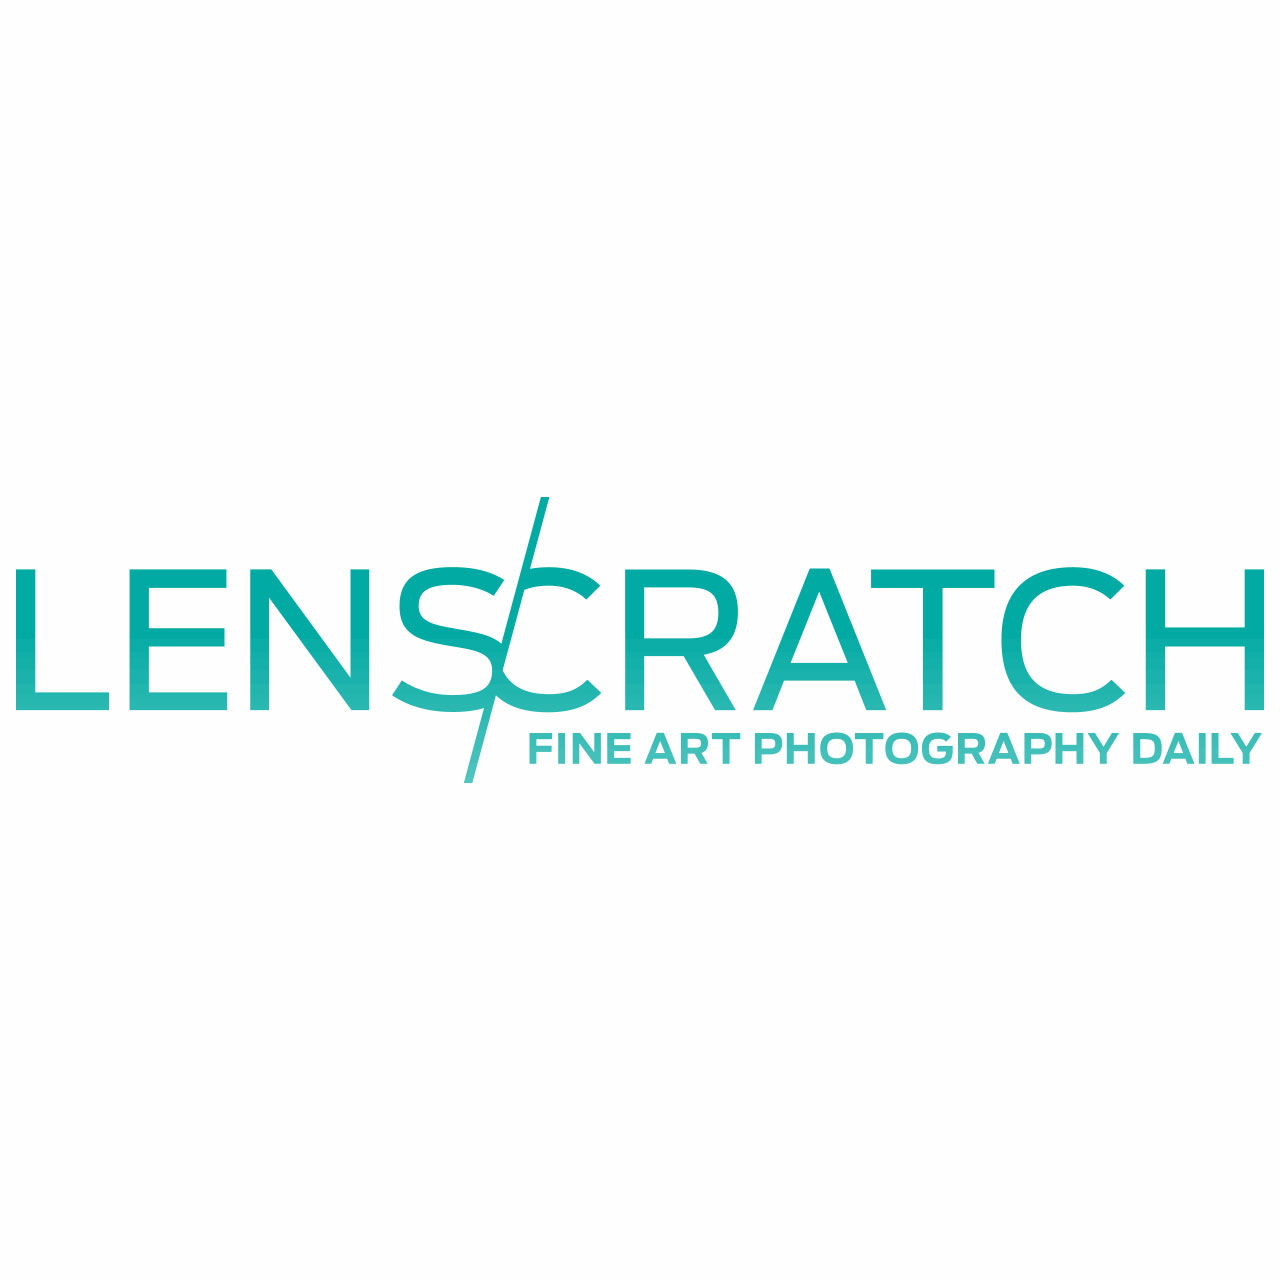 LENSCRATCH_logotag_1280.jpg